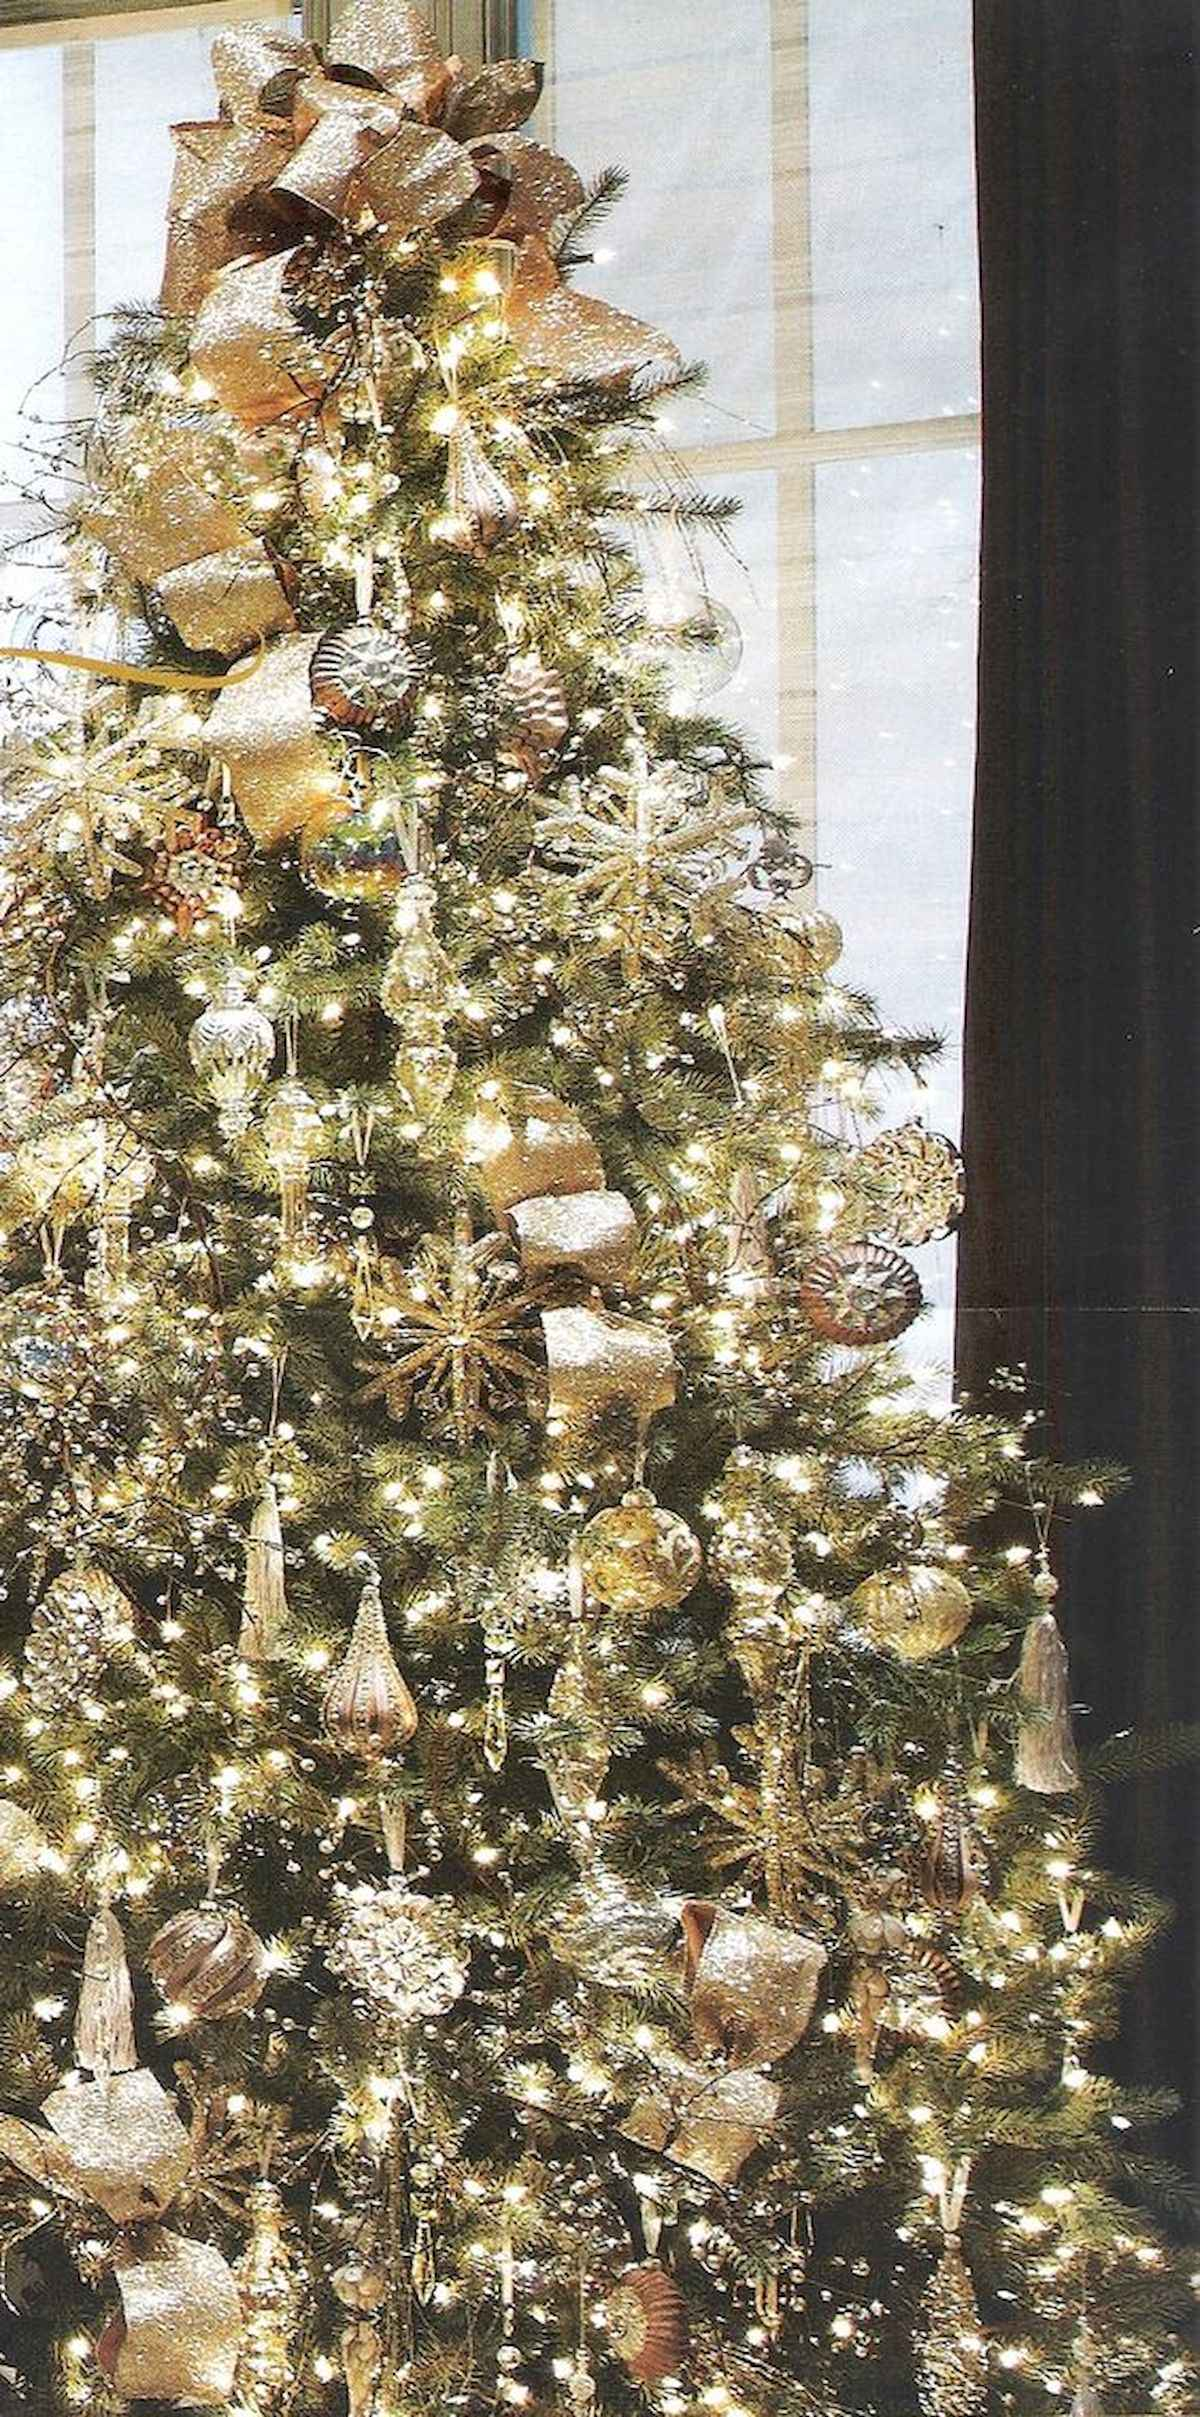 40 elegant christmas tree decorations ideas (35)